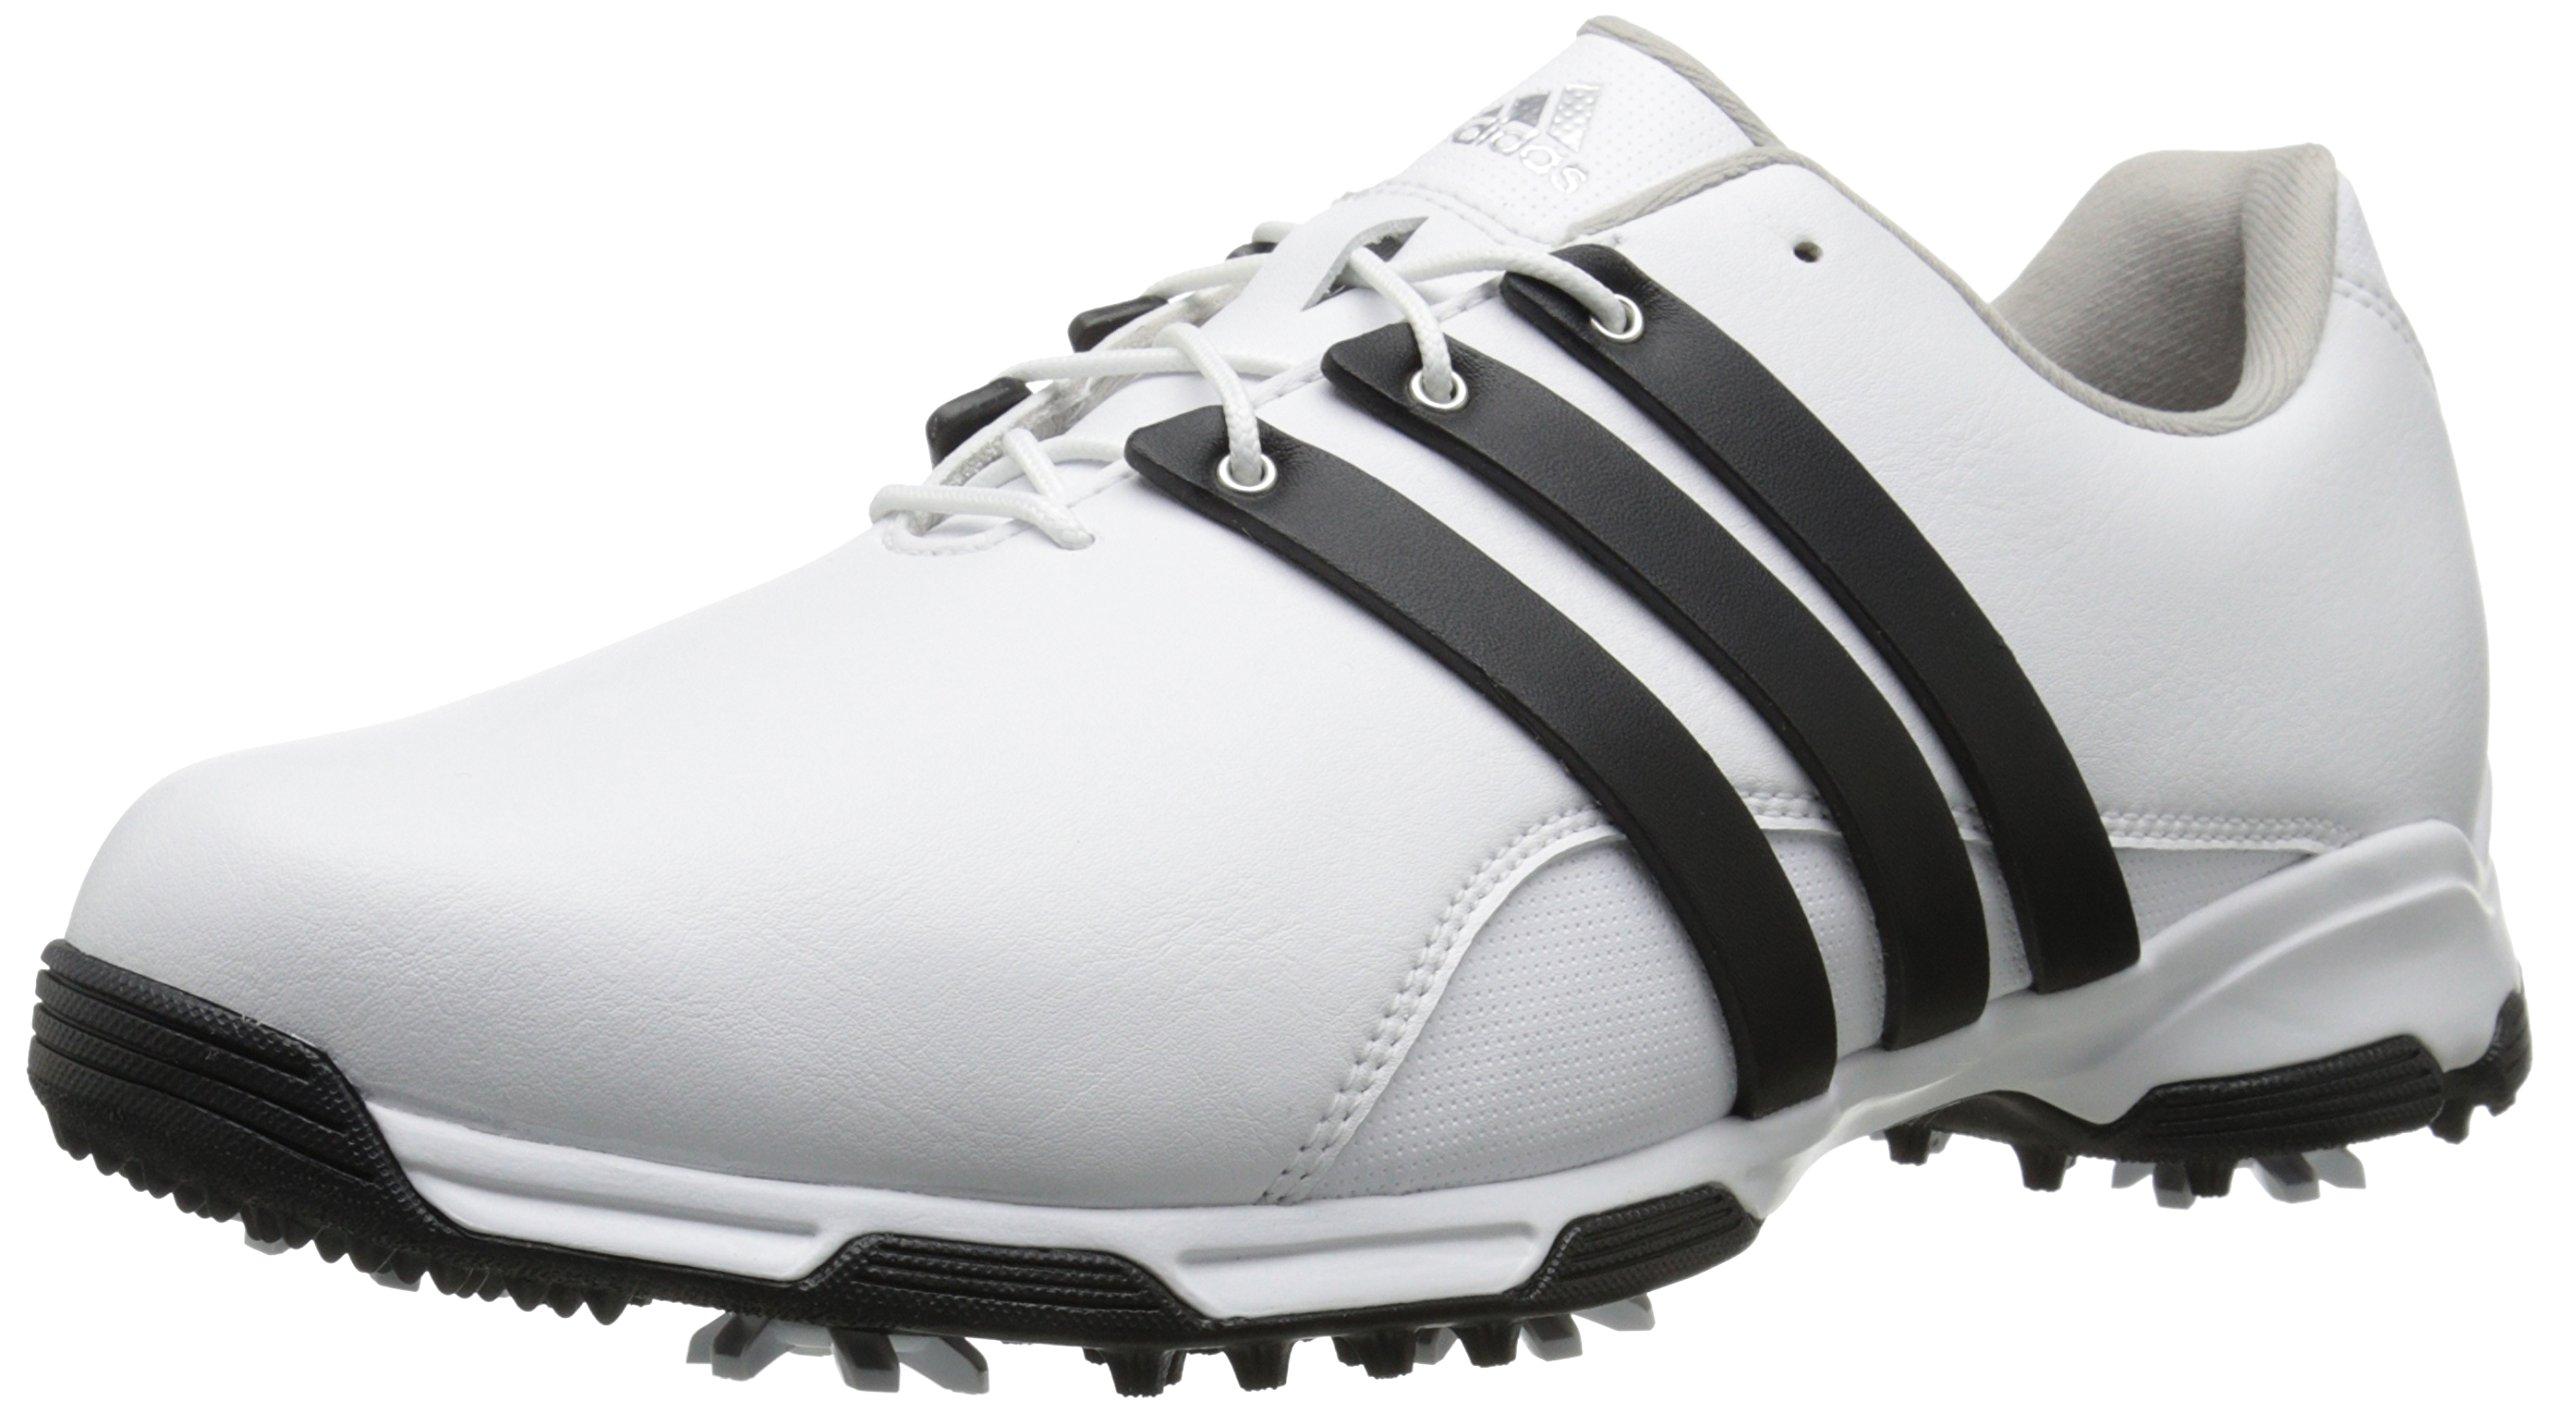 adidas Men's Pure TRX Golf Shoe, White/Core Black/FTWR White, 10.5 M US by adidas